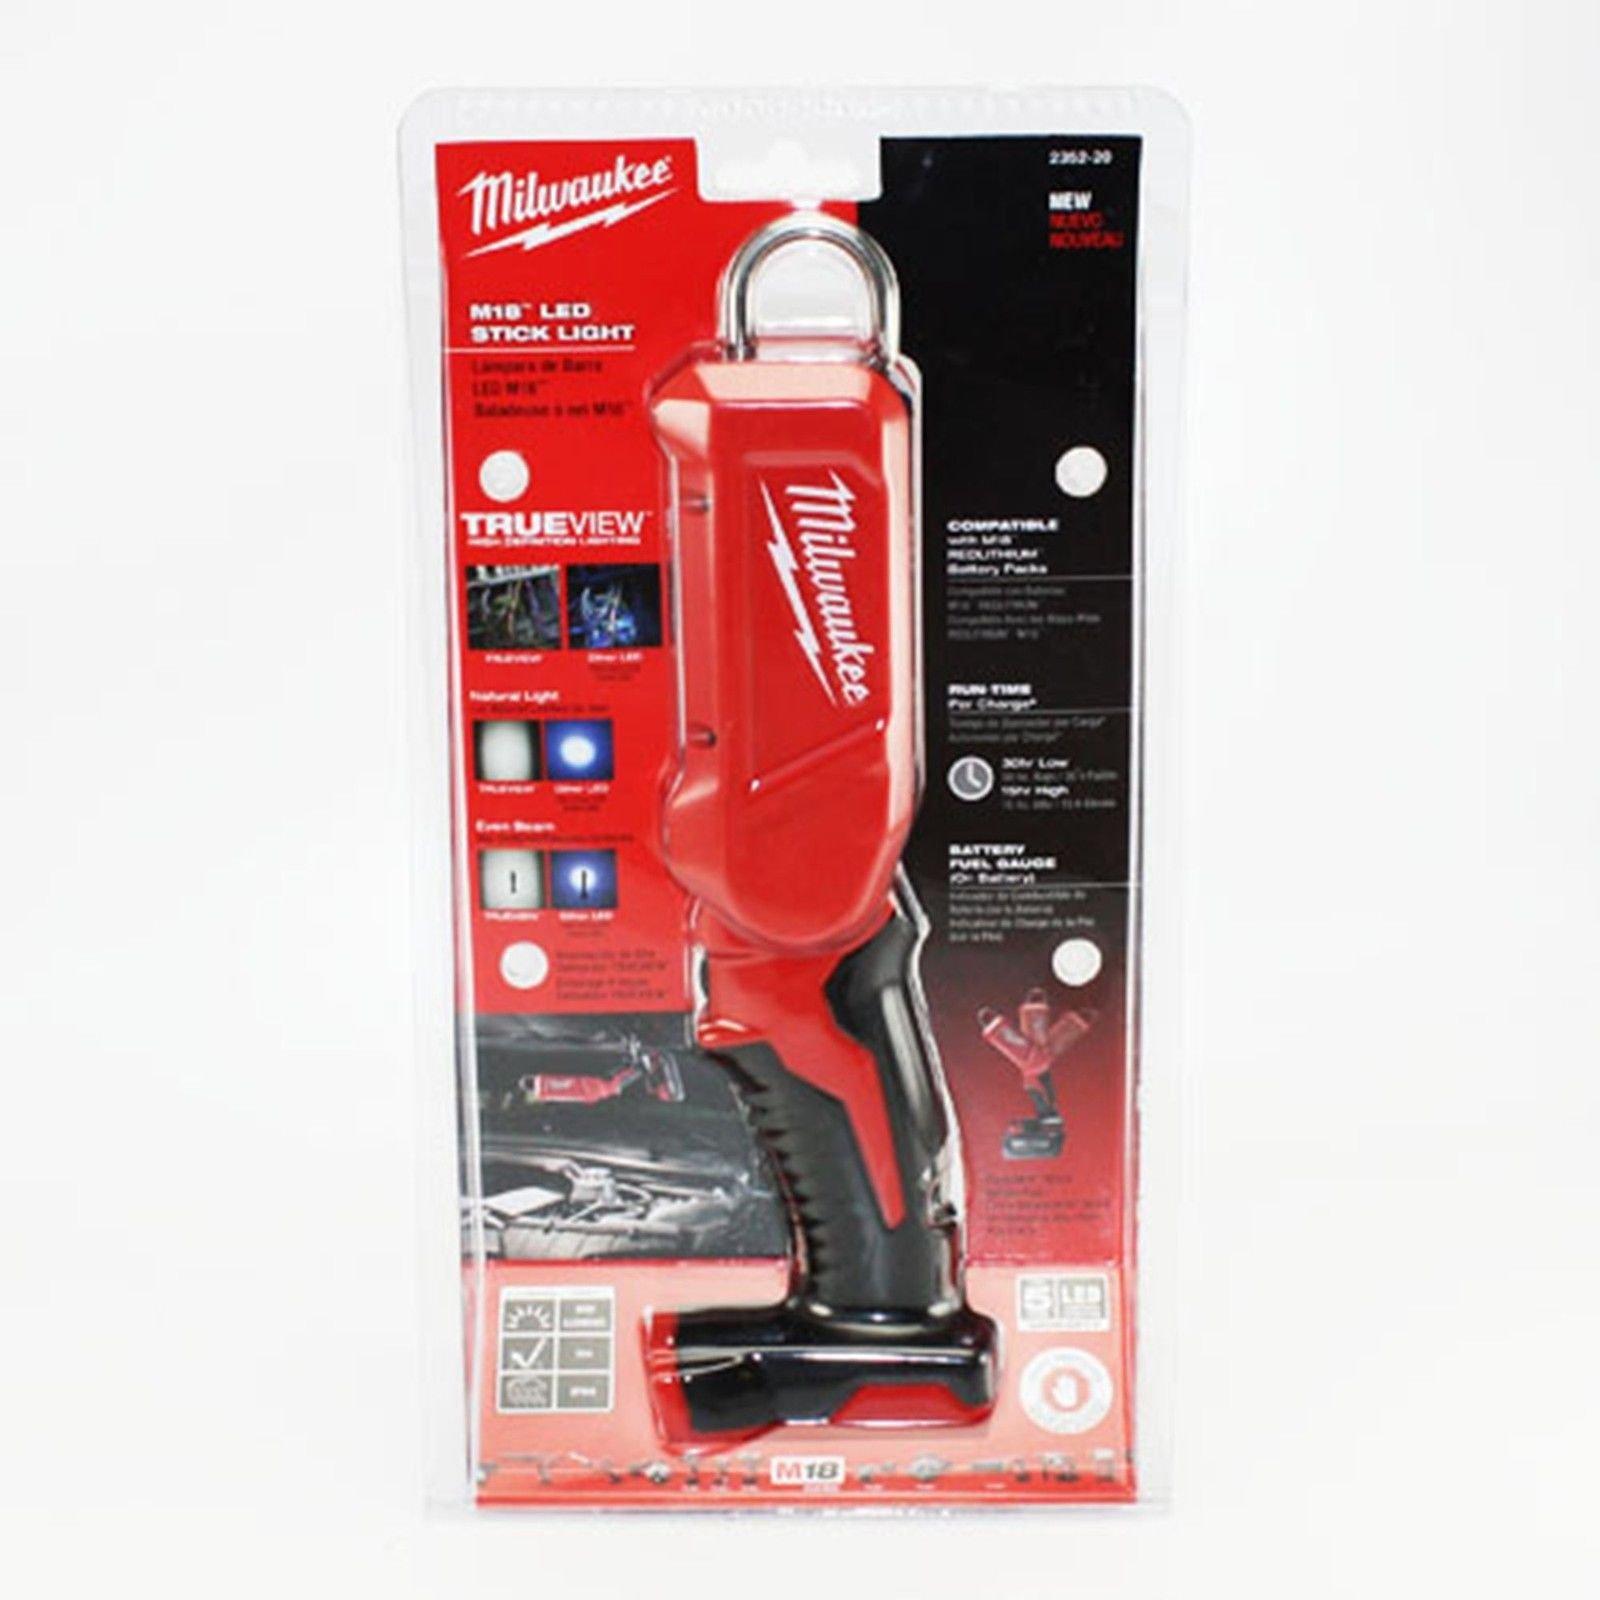 Milwaukee Tool 2352-20 M18 LED Stick Light ,product_by: pandorasoem_105121936939095 by Jonyandwater